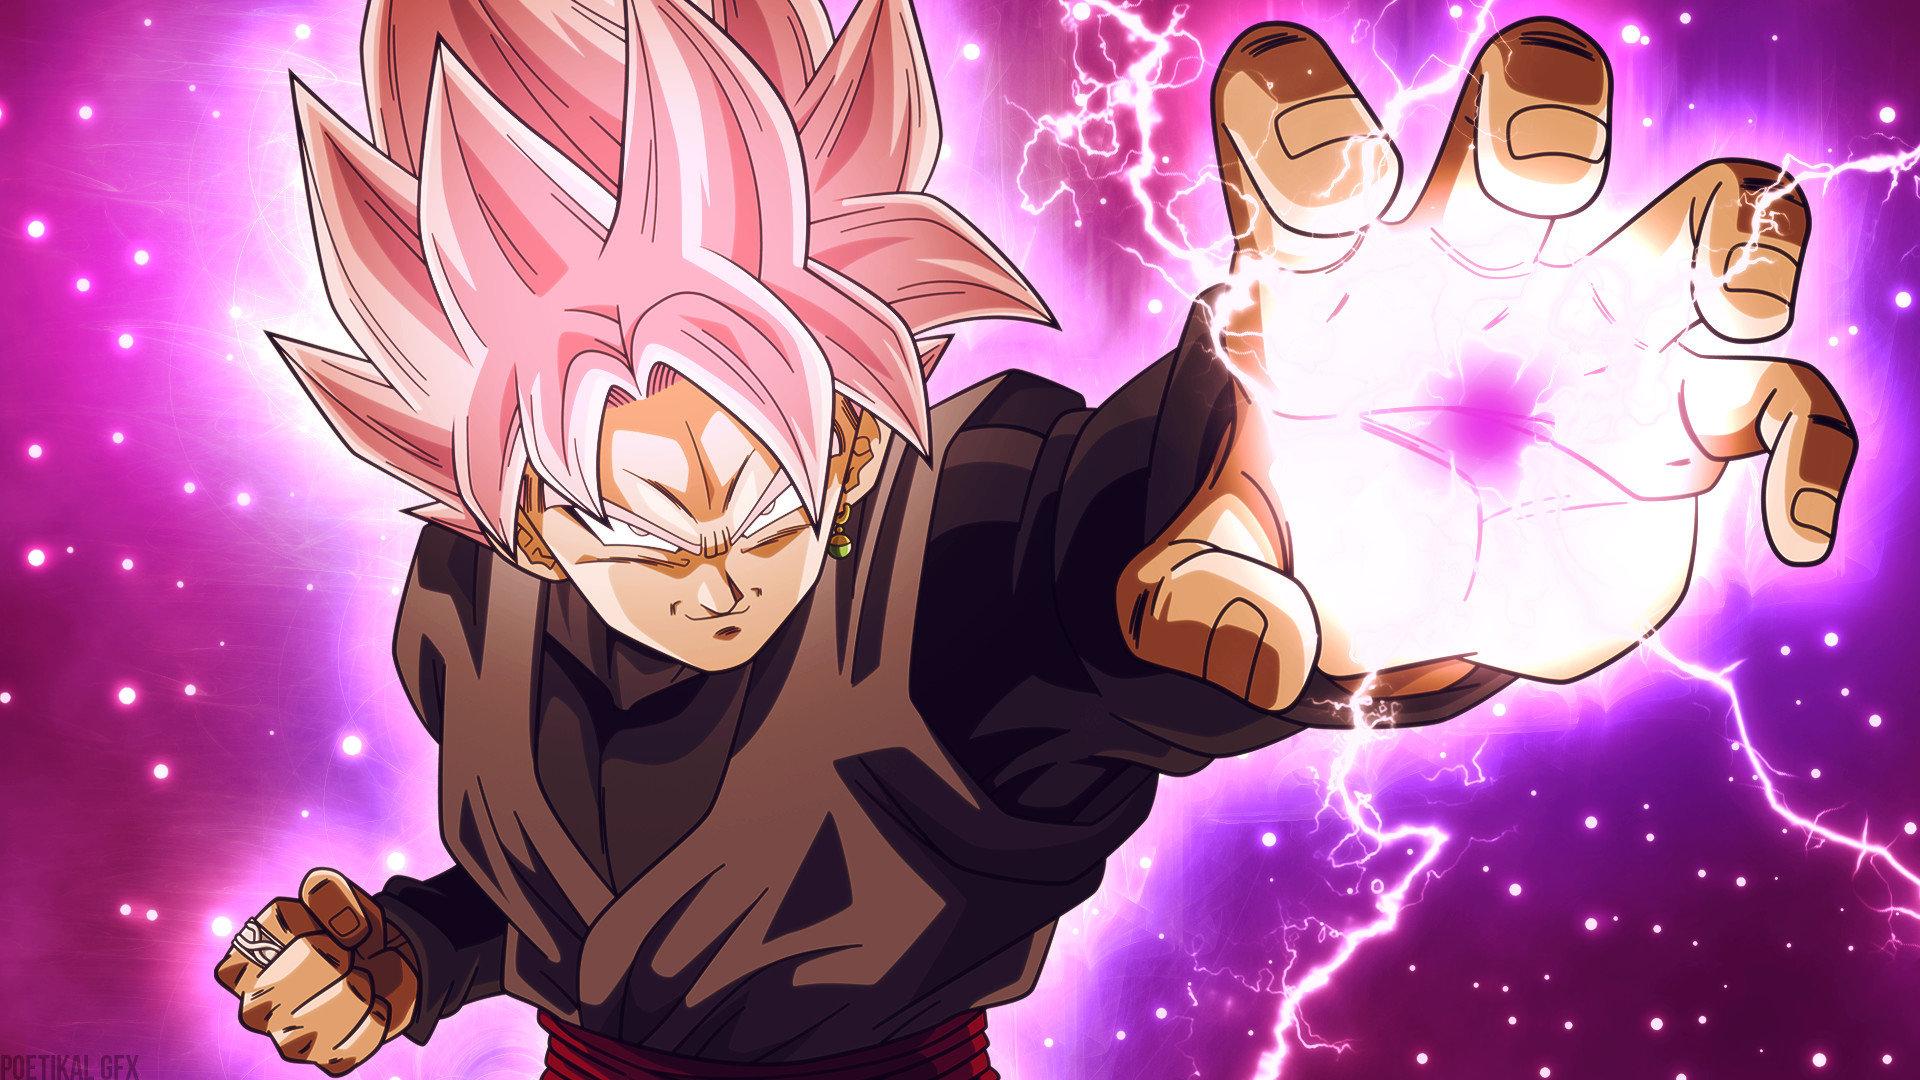 Dragon Ball Super Goku Rose 49646 Hd Wallpaper